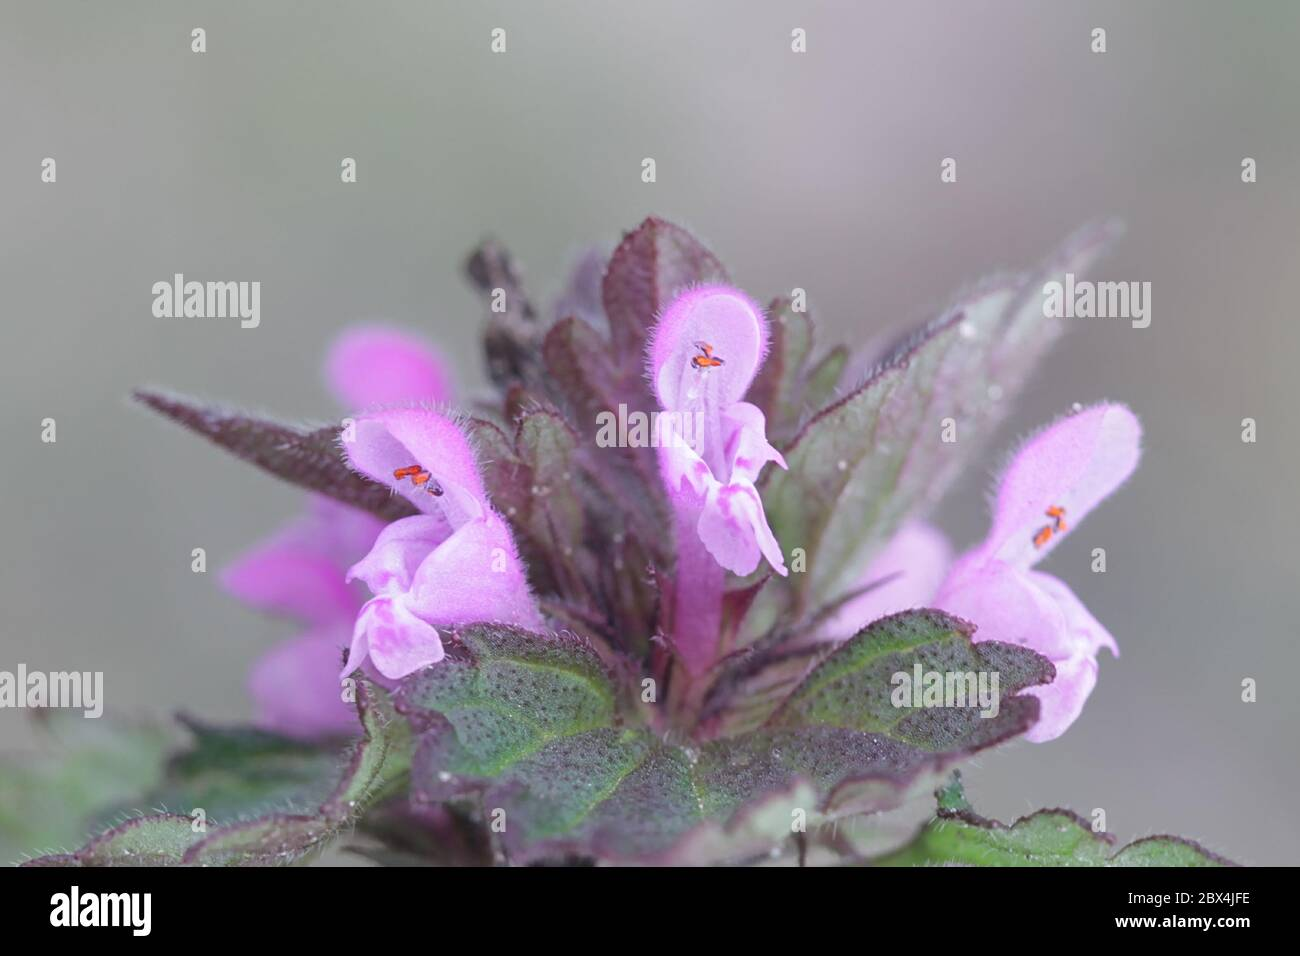 Lamium hybridum, known as Cut-leaved Dead-nettle, wild flower from Finland Stock Photo